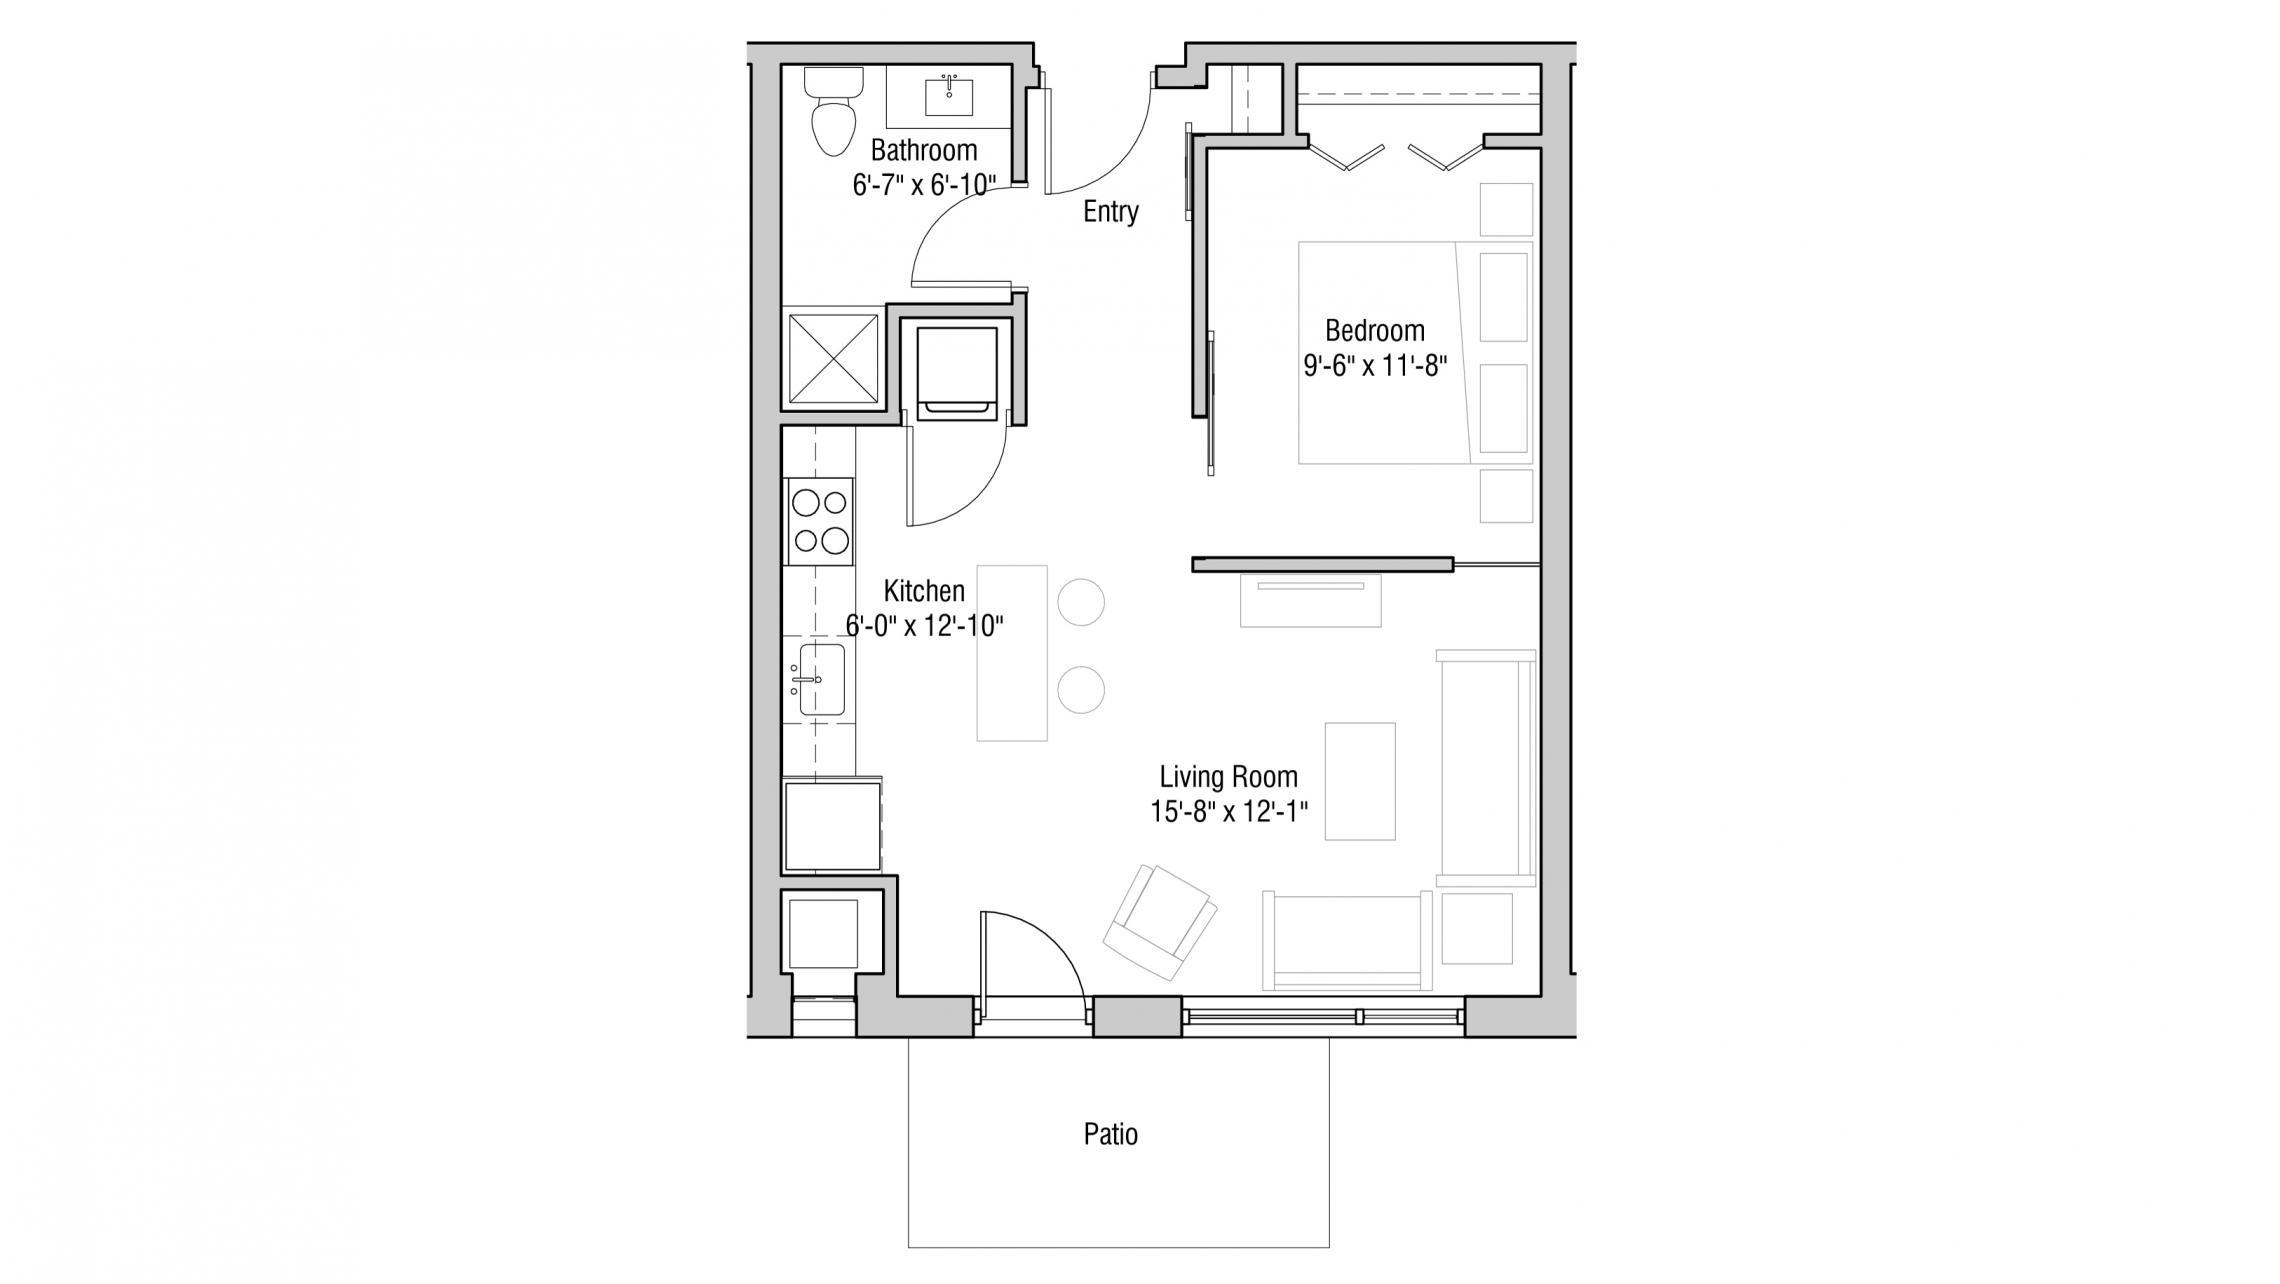 ULI Quarter Row 110 - One Bedroom, One Bathroom